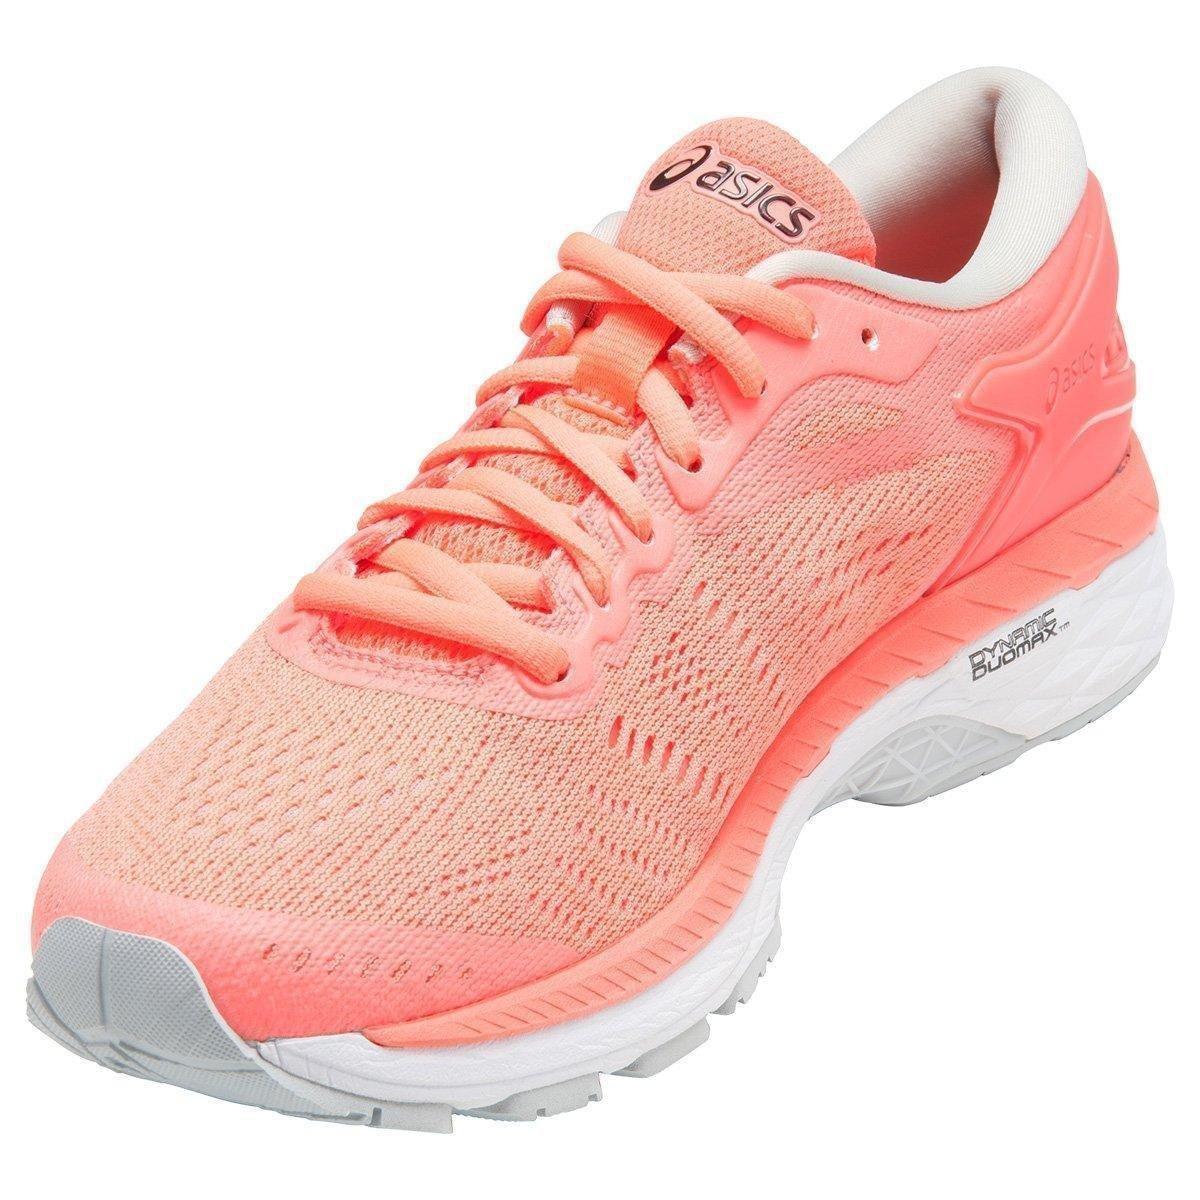 Tênis Asics Gel-Kayano 24 Feminino - Coral - Compre Agora  31d2fe279d250